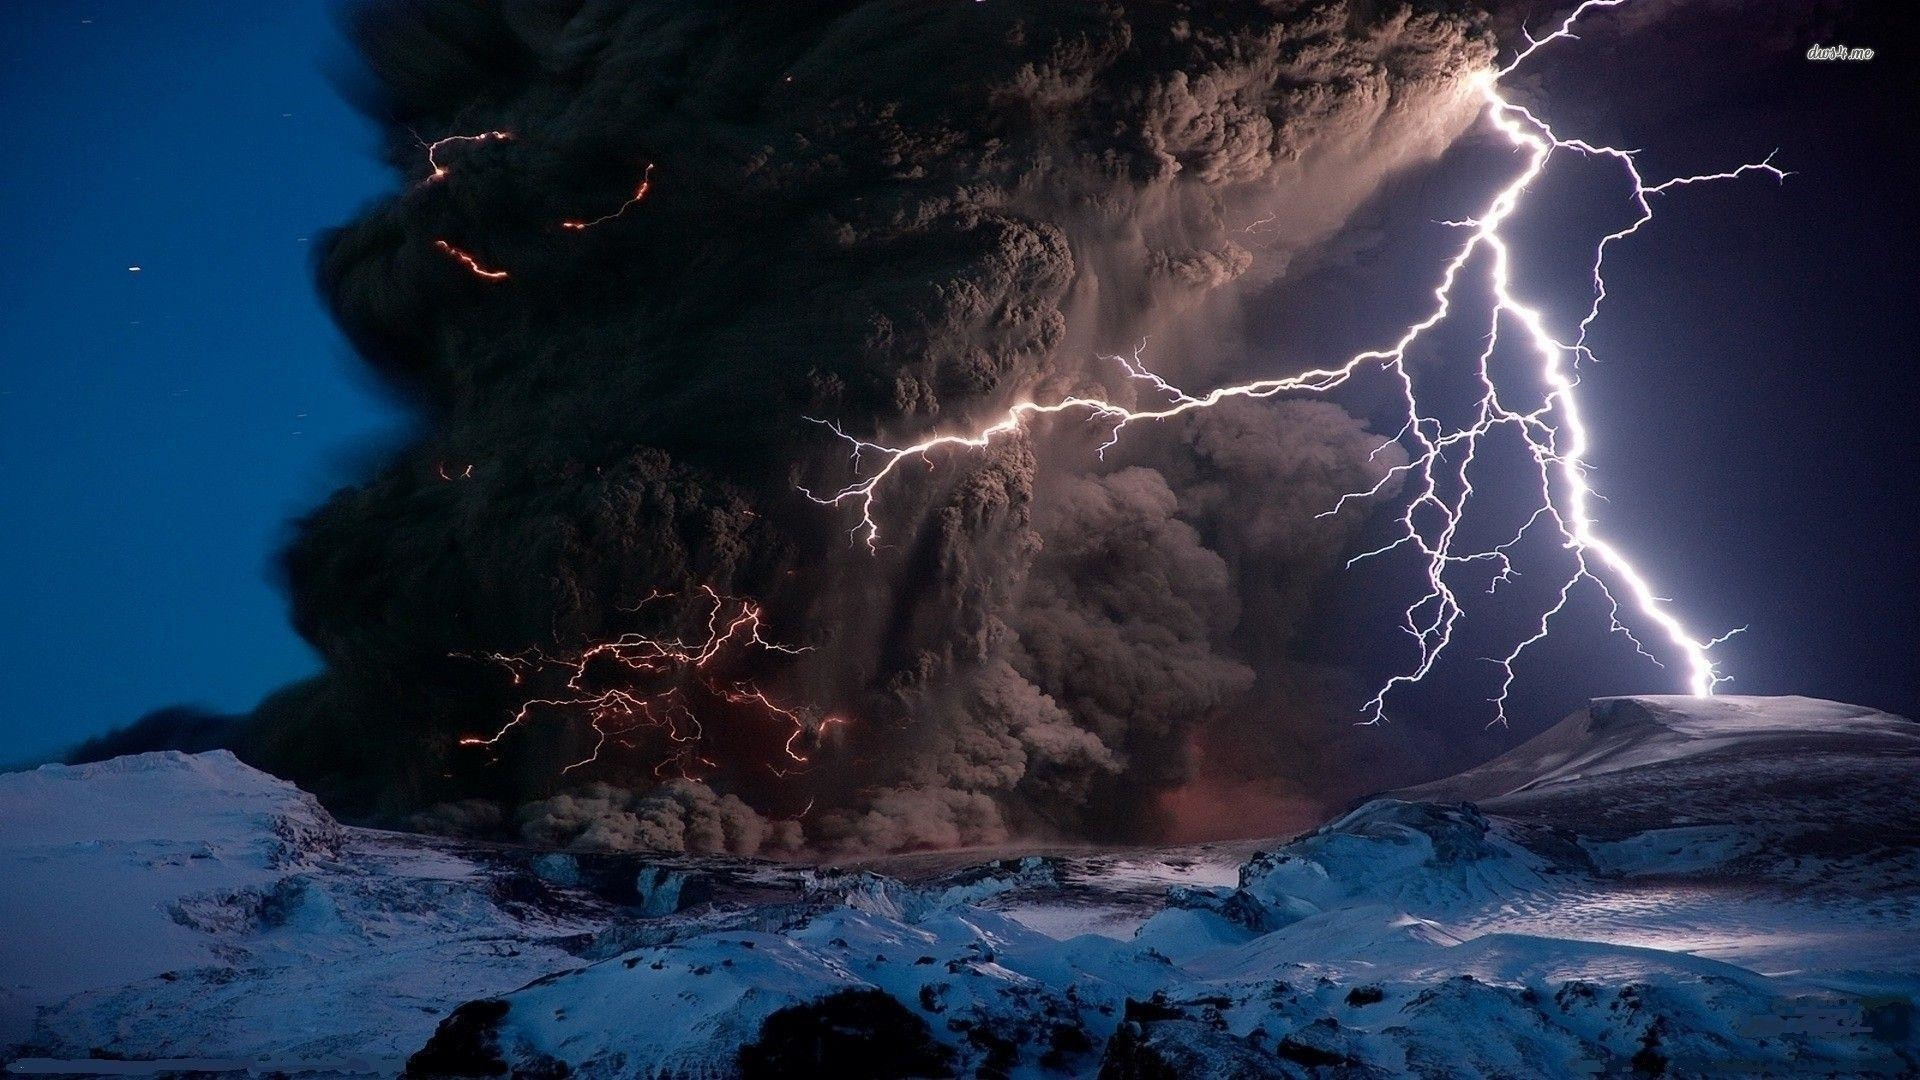 Volcano Lightning Wallpapers – HD Wallpapers Inn